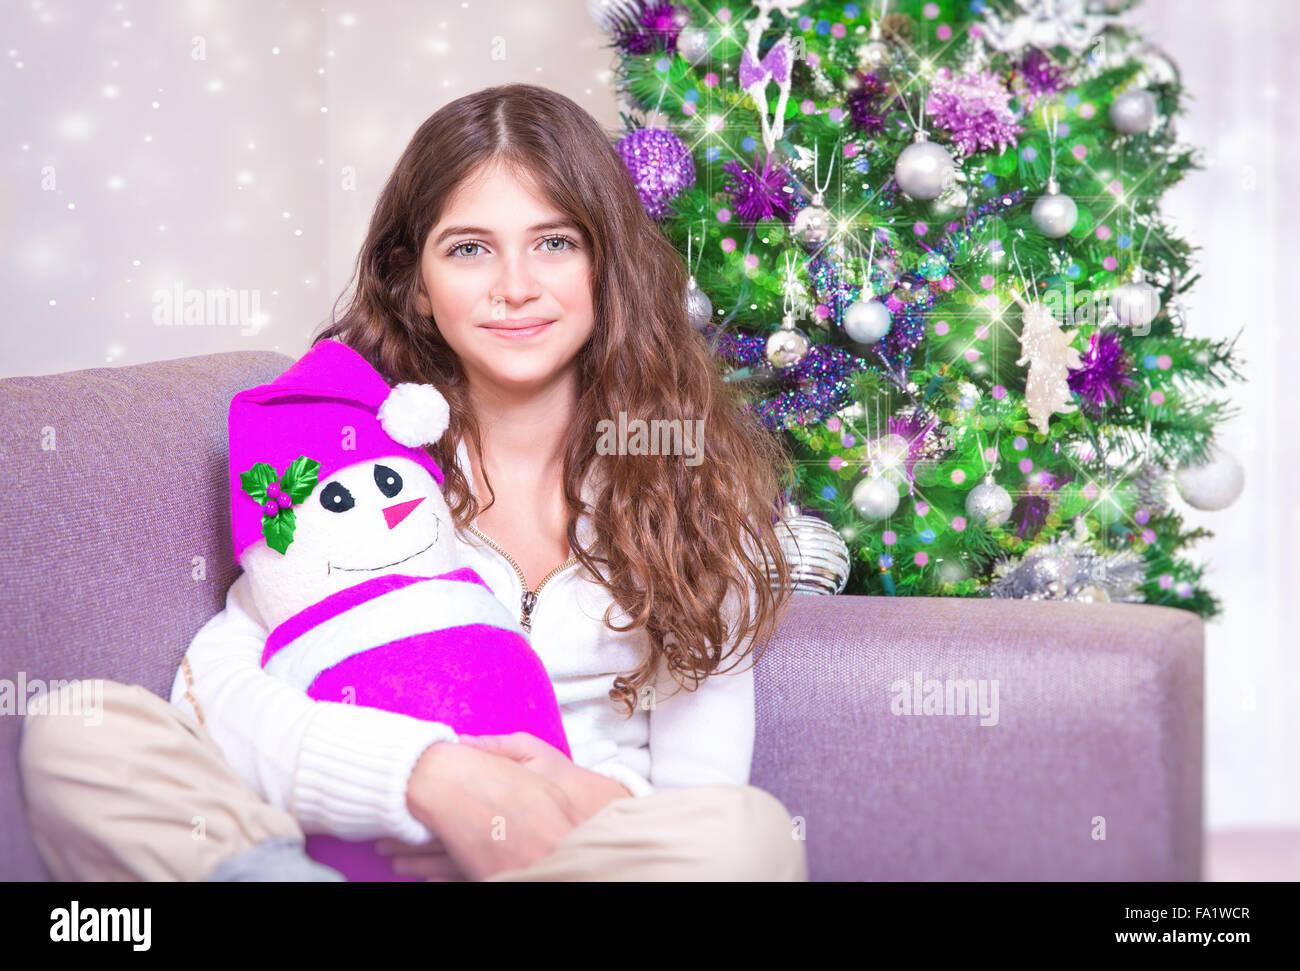 Soft Toy Snowman Stockfotos & Soft Toy Snowman Bilder - Alamy